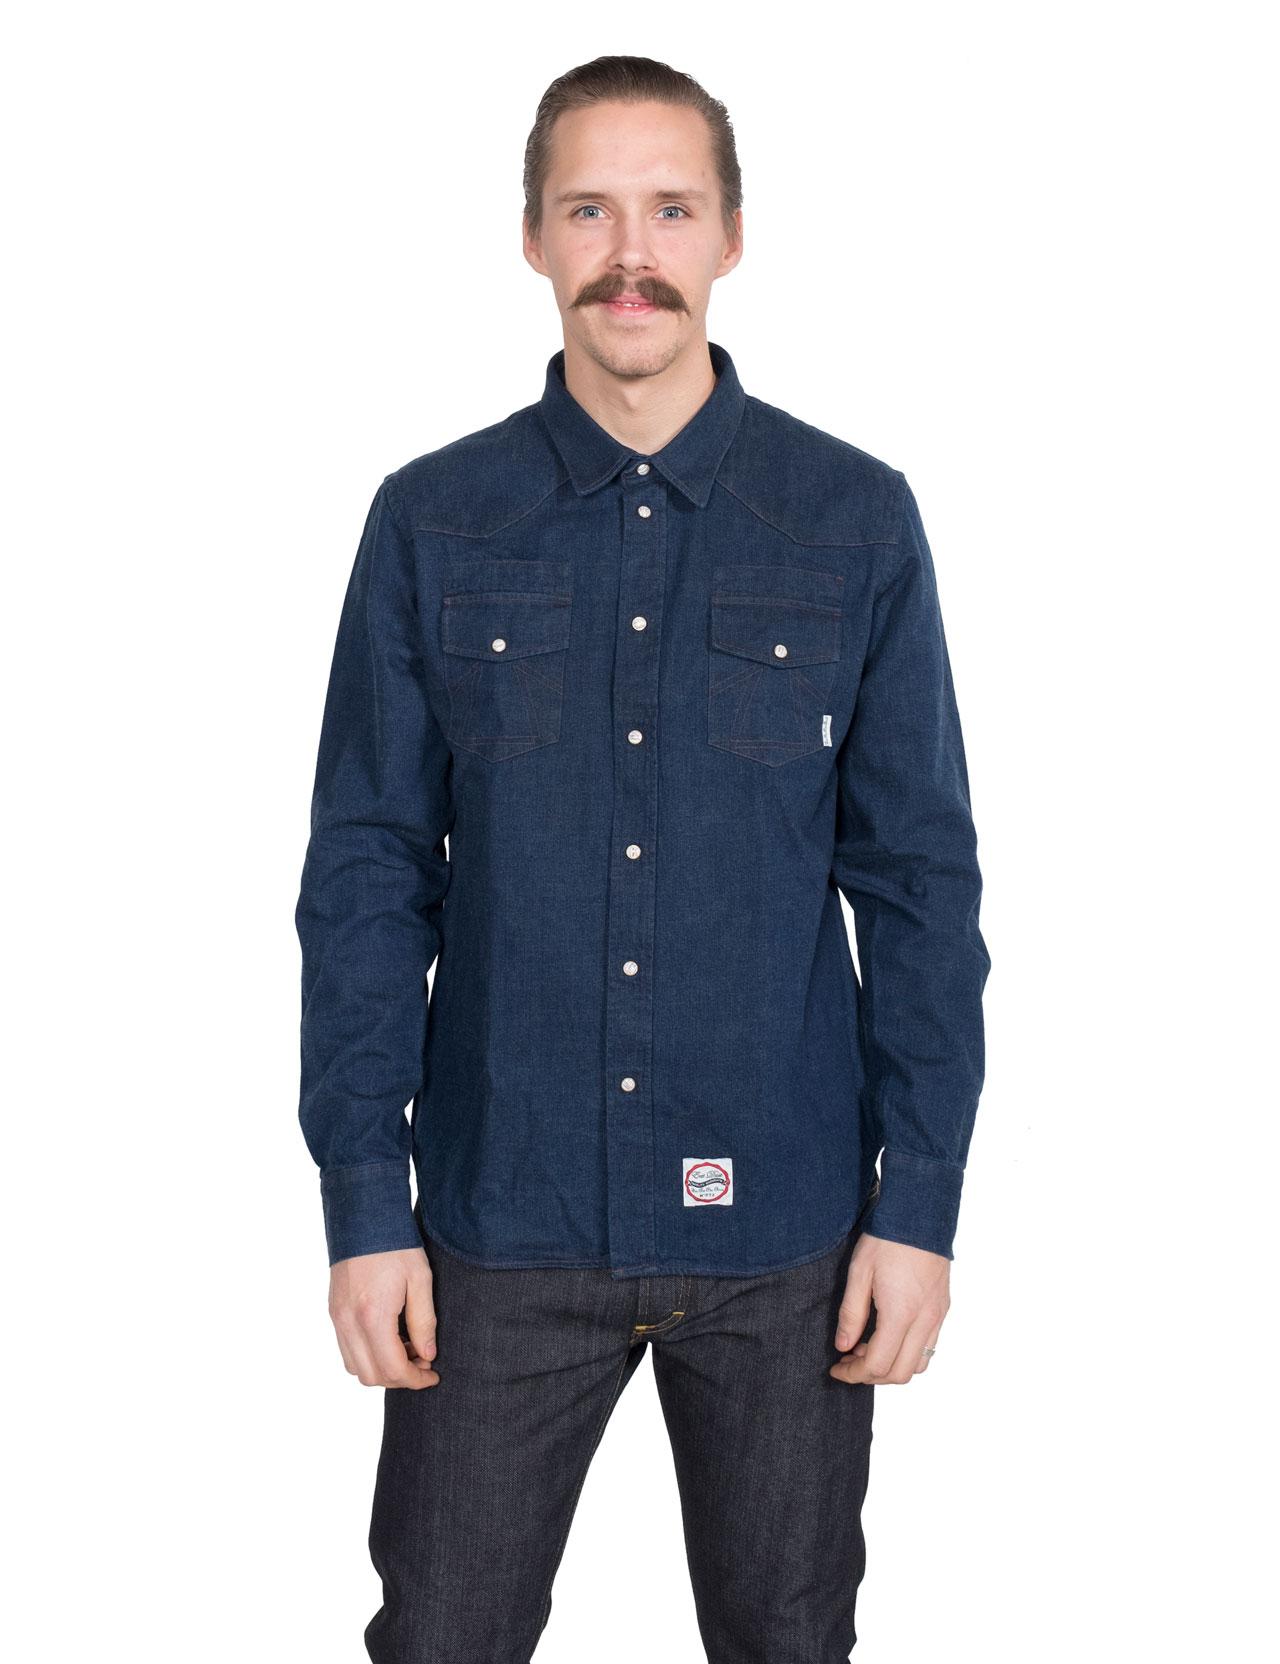 0cfc3e62502 Eat Dust - Heavy Denim Western Shirt - Indigo Blue